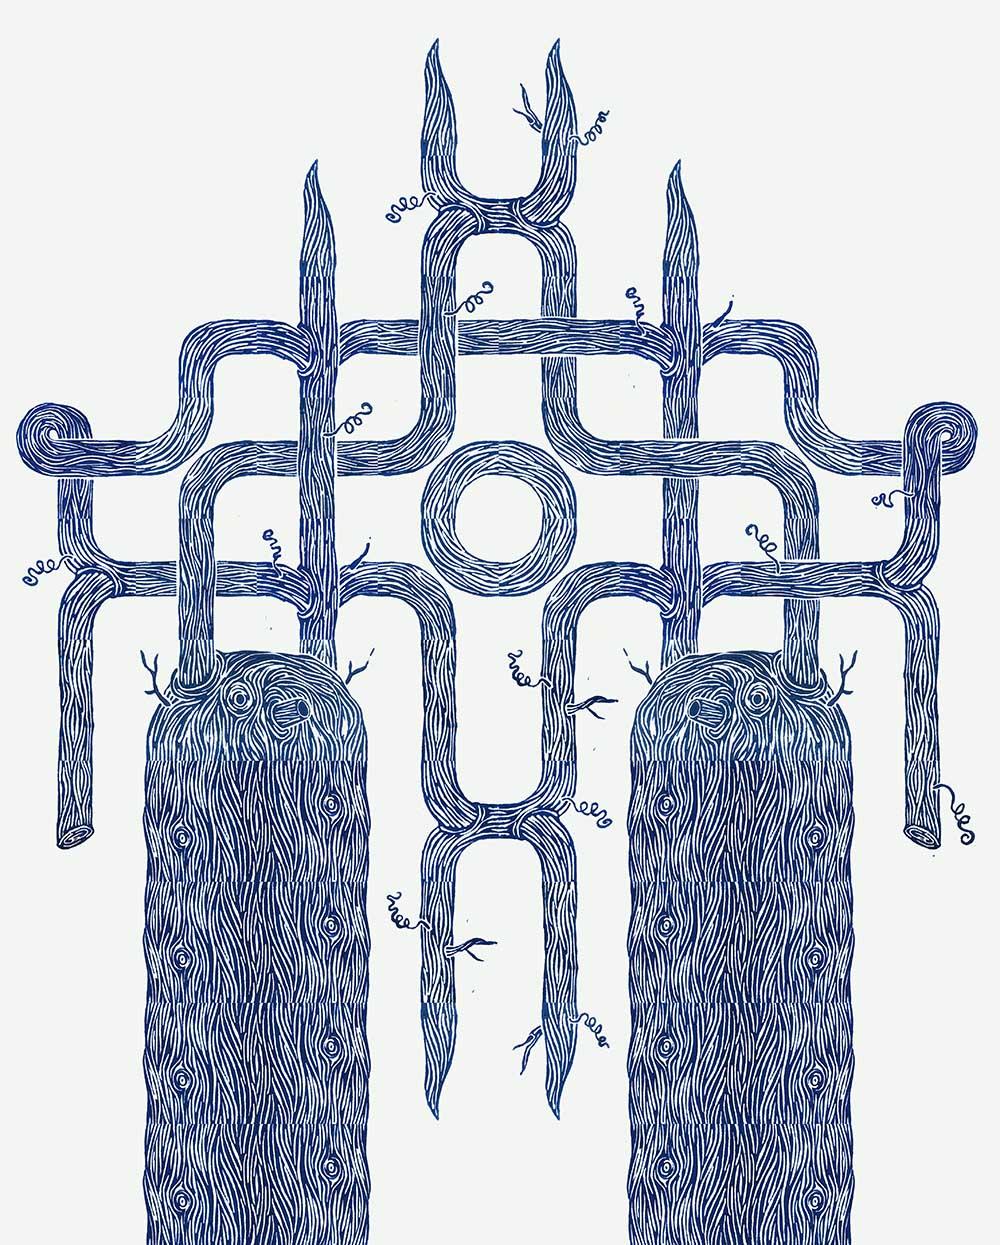 baptiste-vandaele-treefamily3